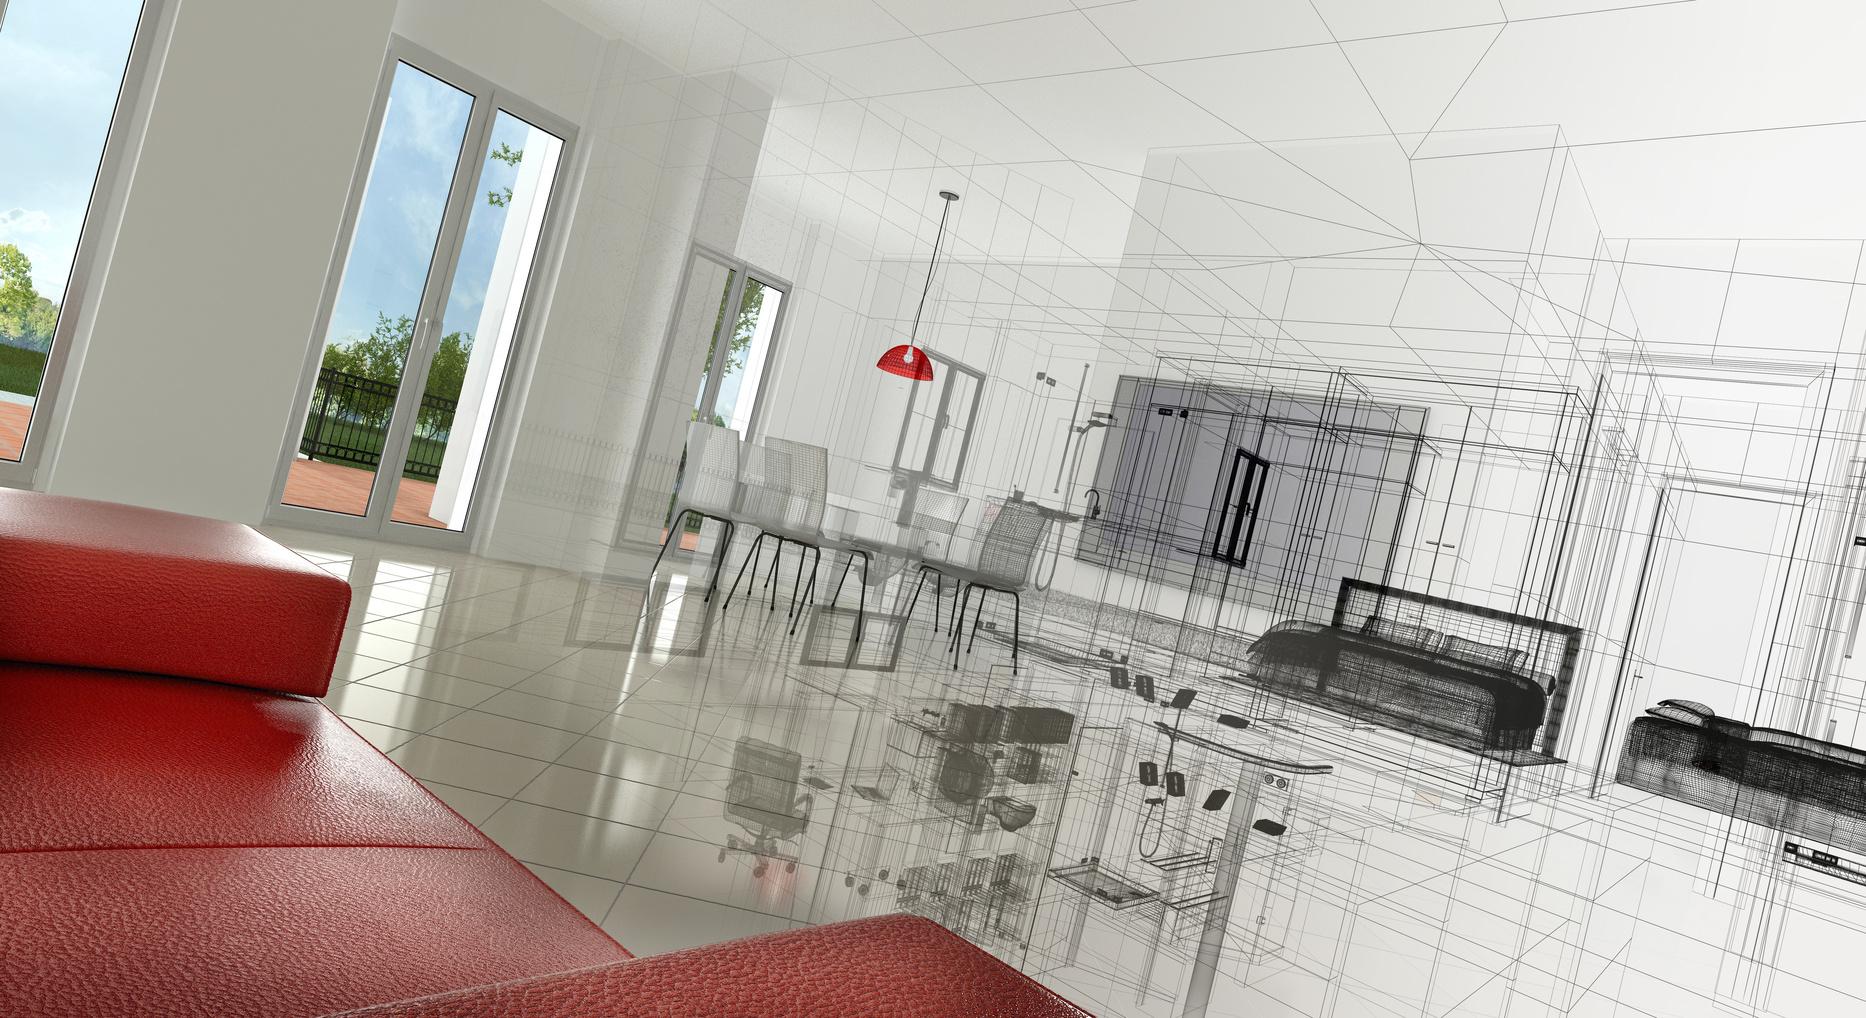 relooking maison virtuel gratuit avie home. Black Bedroom Furniture Sets. Home Design Ideas